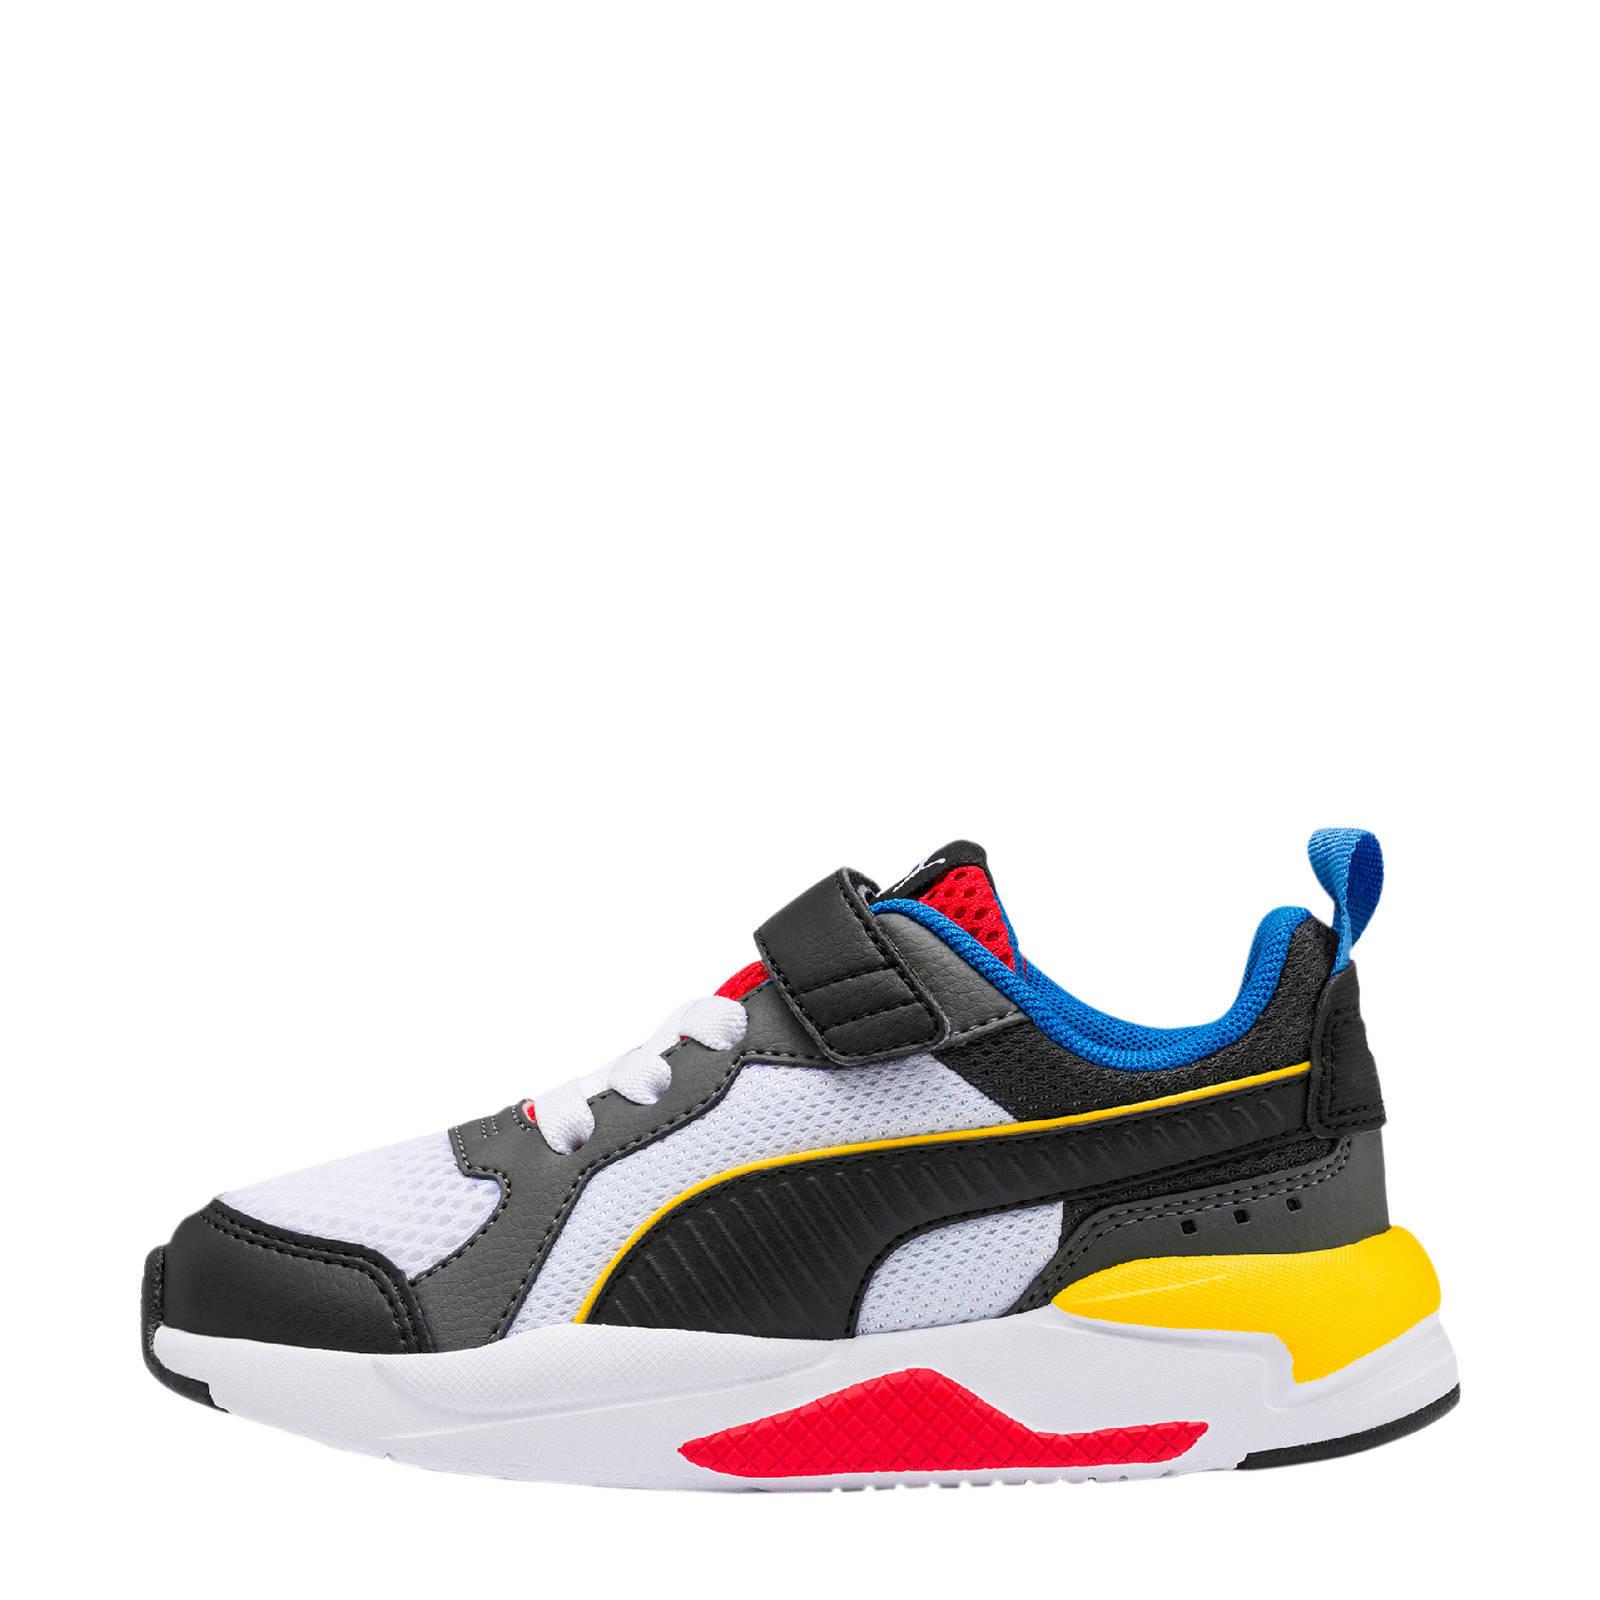 Puma X-Ray AC PS sneakers wit/zwart/rood/geel | wehkamp